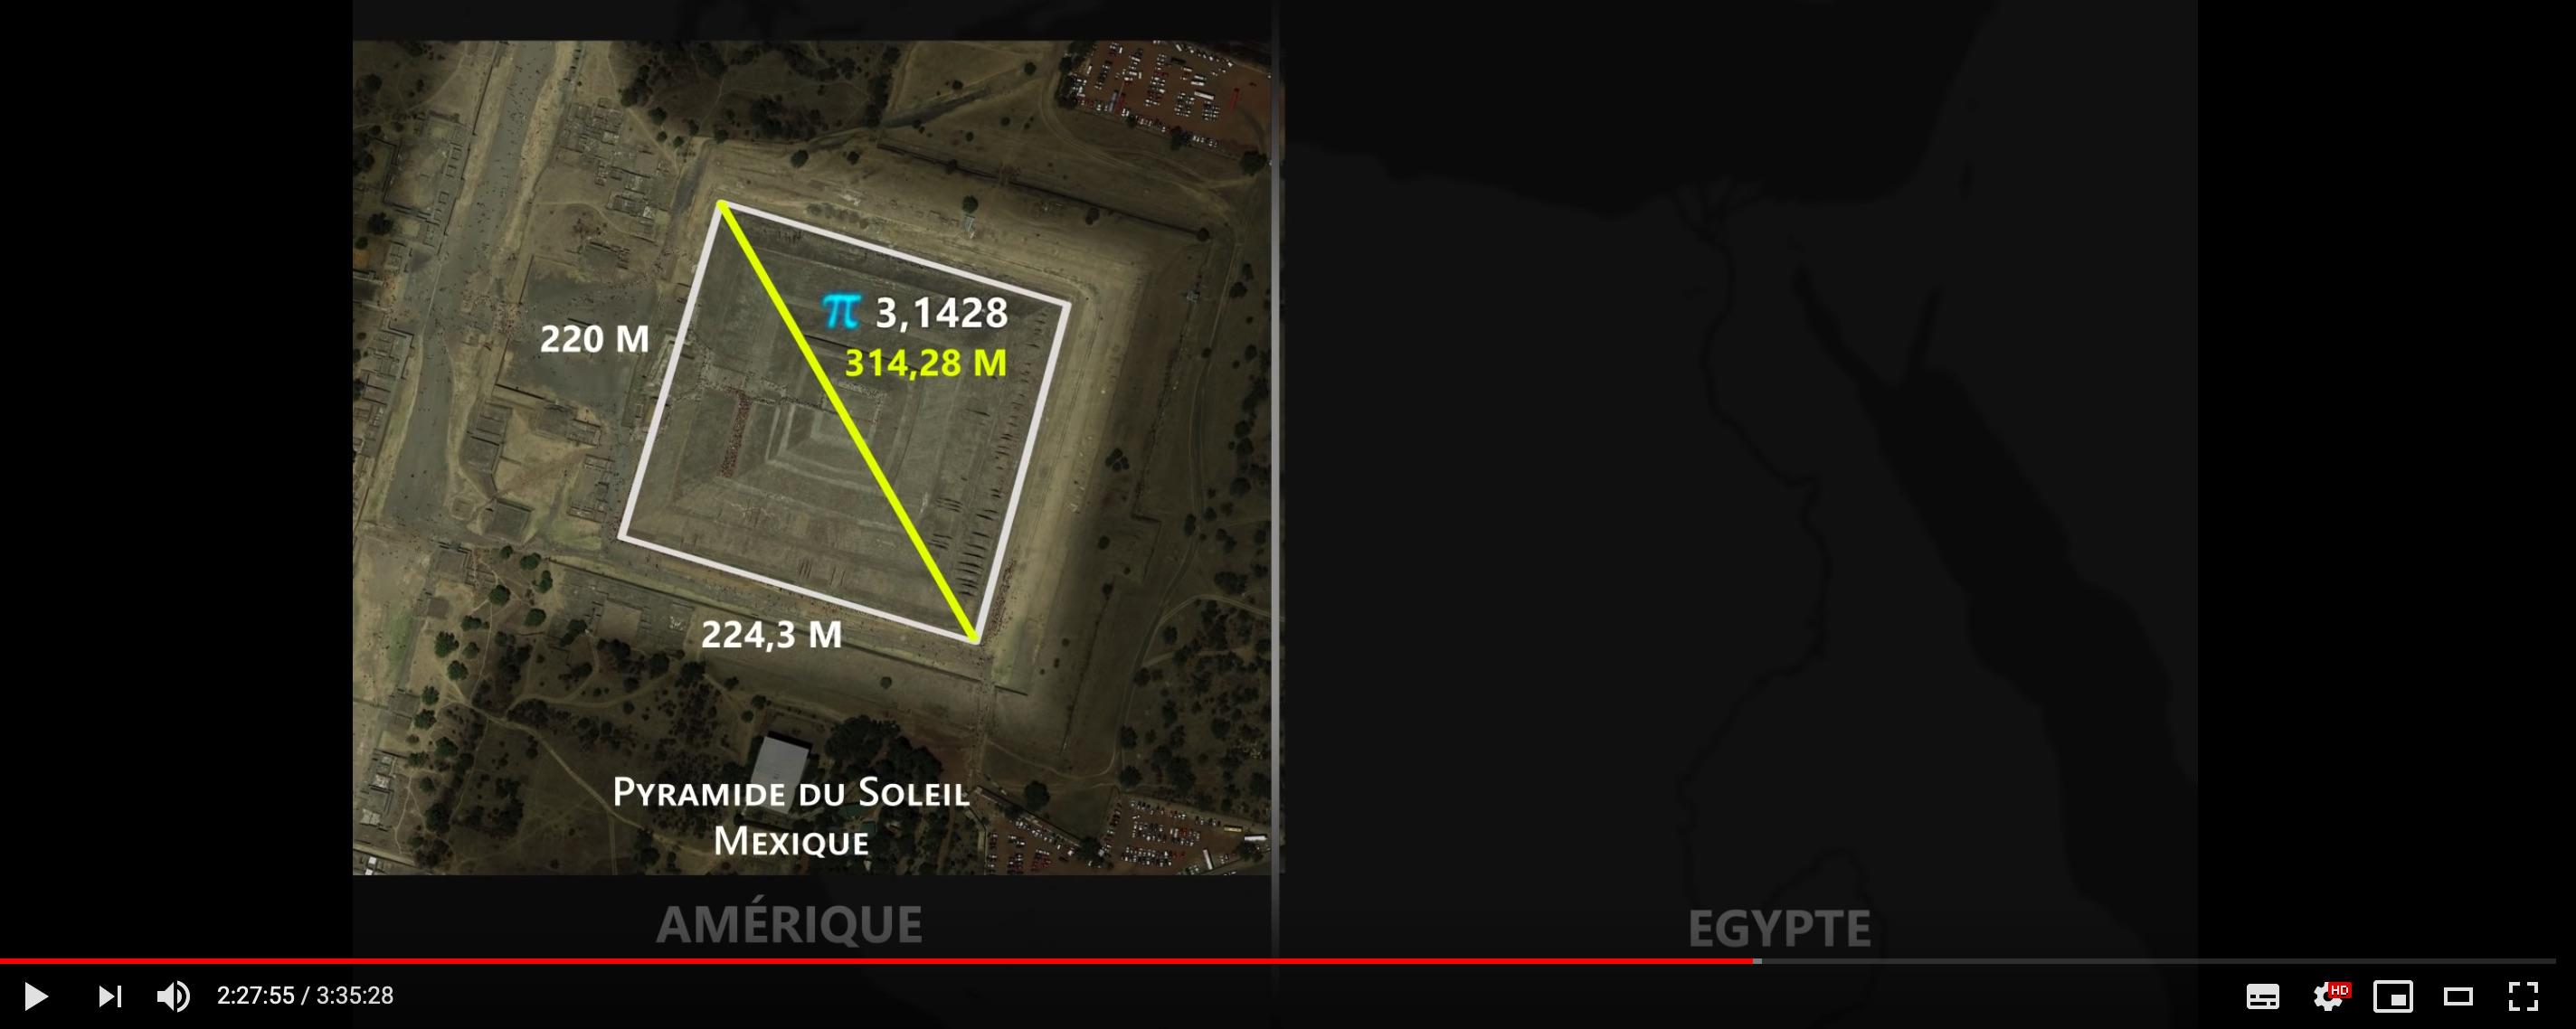 2019-12-06 17:48:59